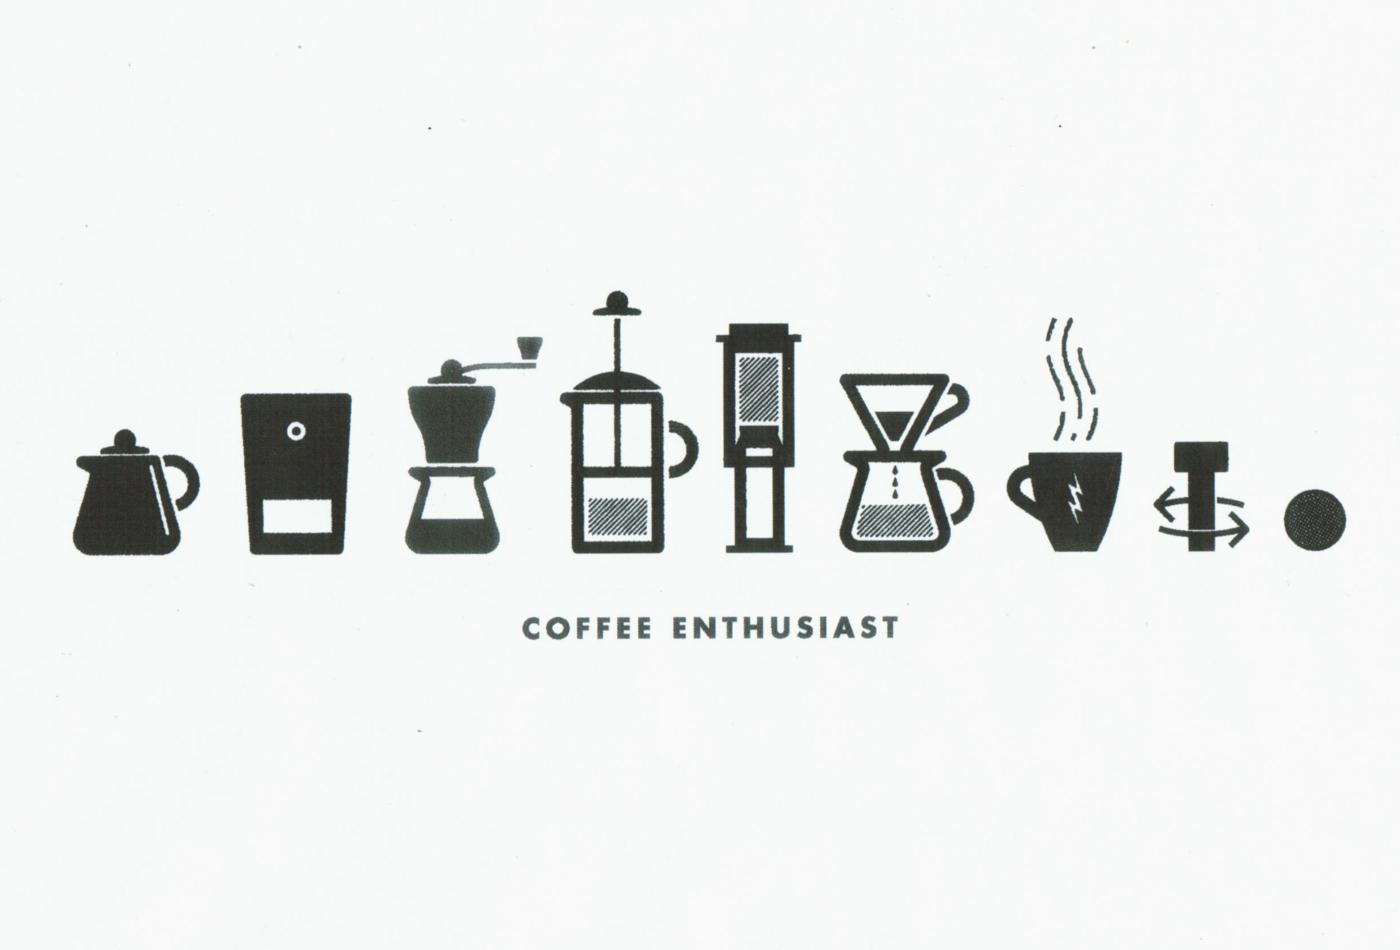 08-sargento-sergeant-martinho-coffee-brand-marks-logo-vacaliebres1-hario-kalita